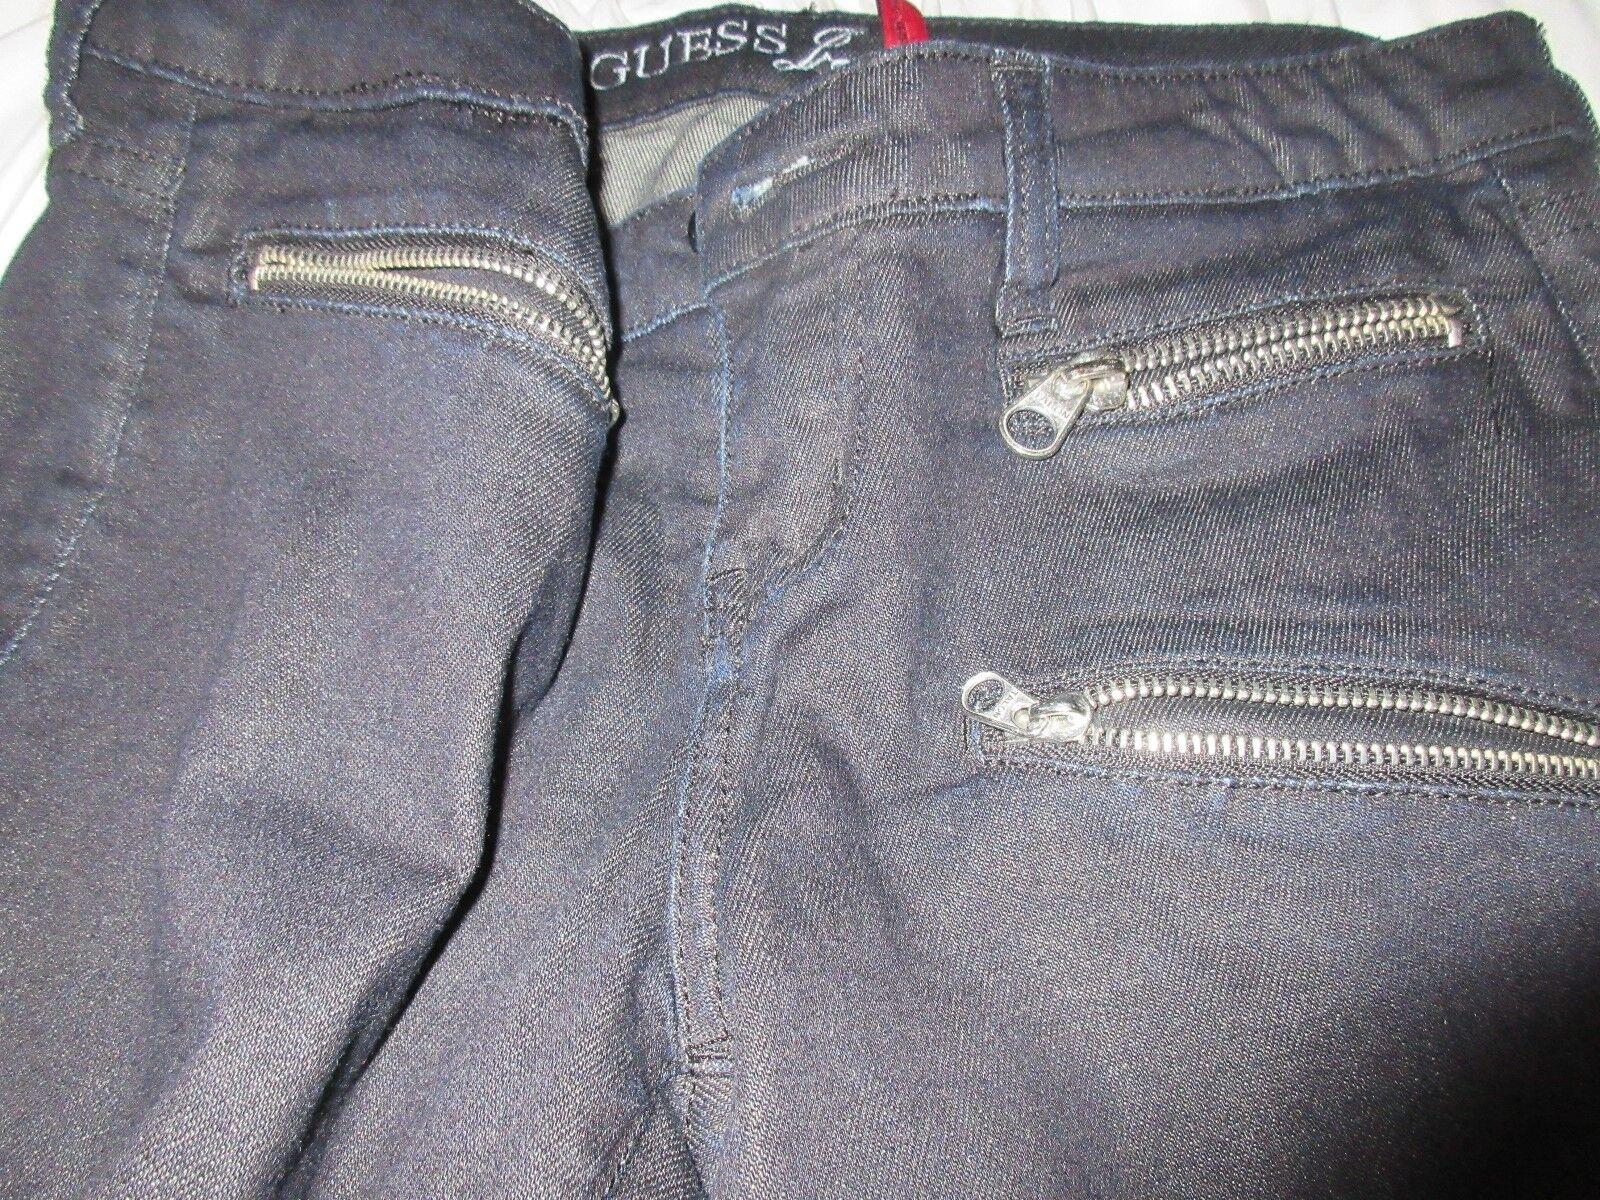 Guess Jeans , Power Skinny , Size 28 , Zipper Pockets ,